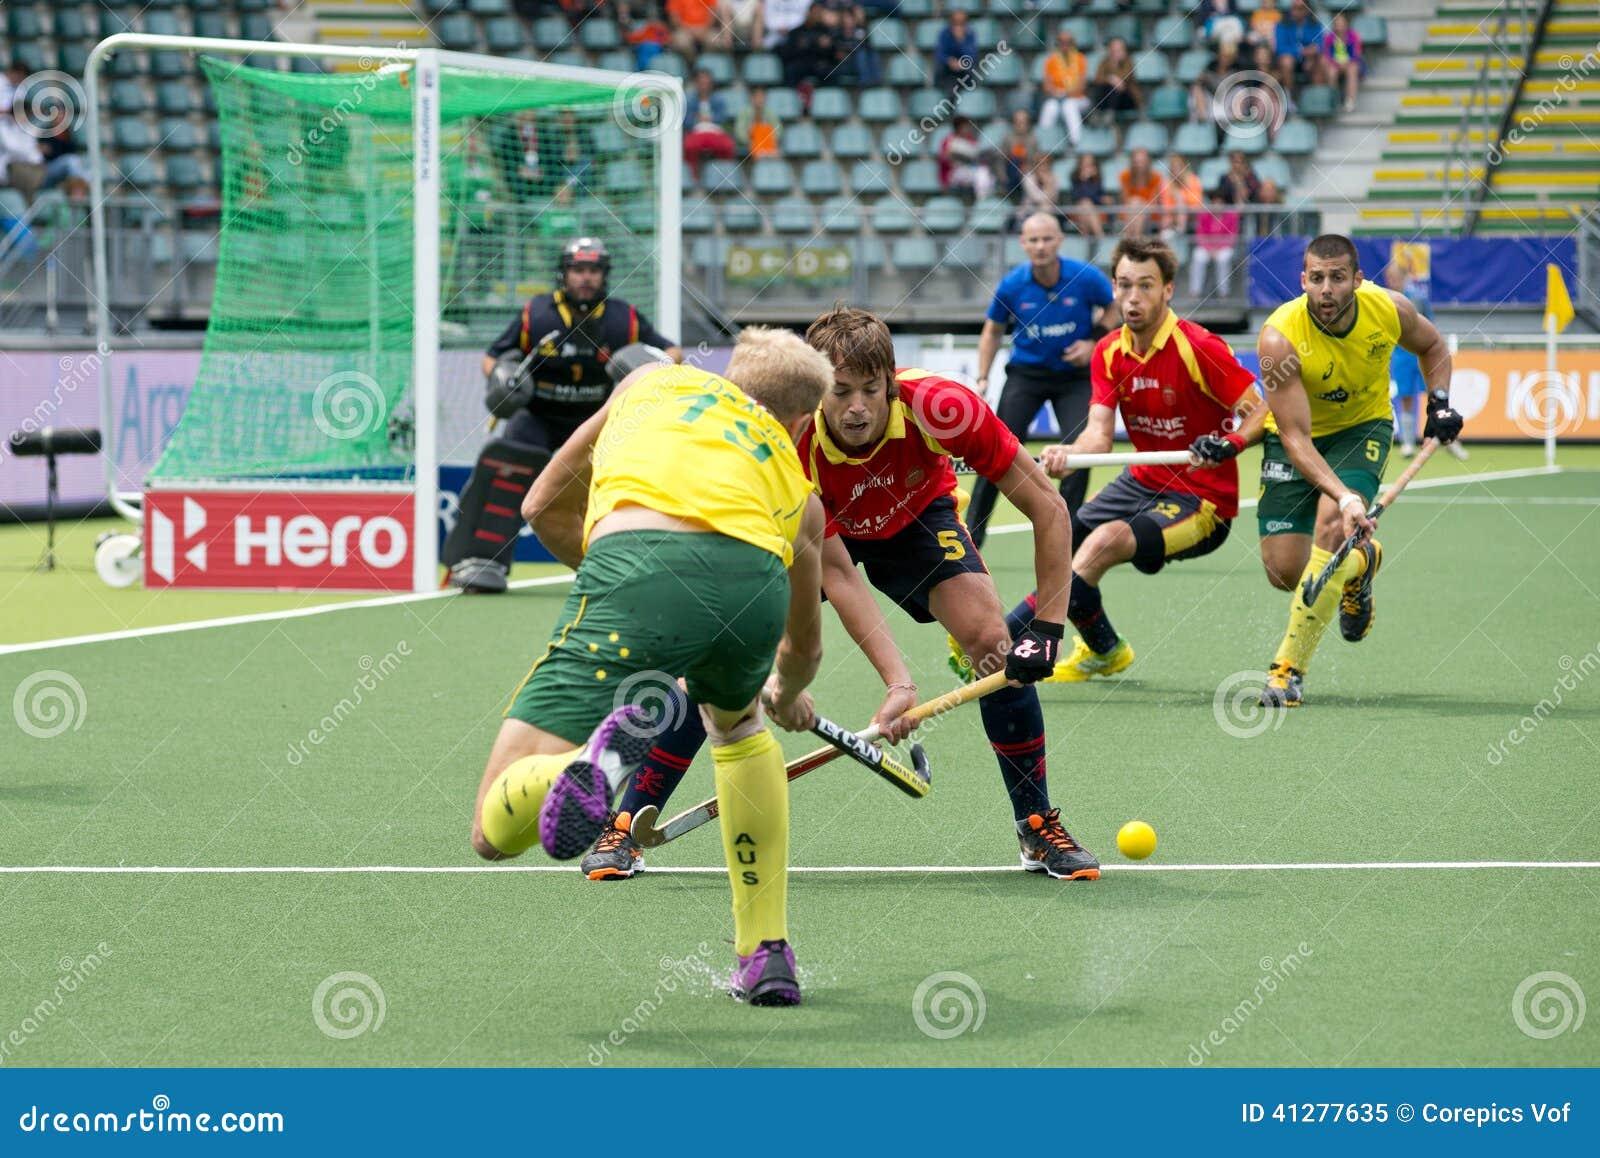 Field Hockey action AUS vs ESP